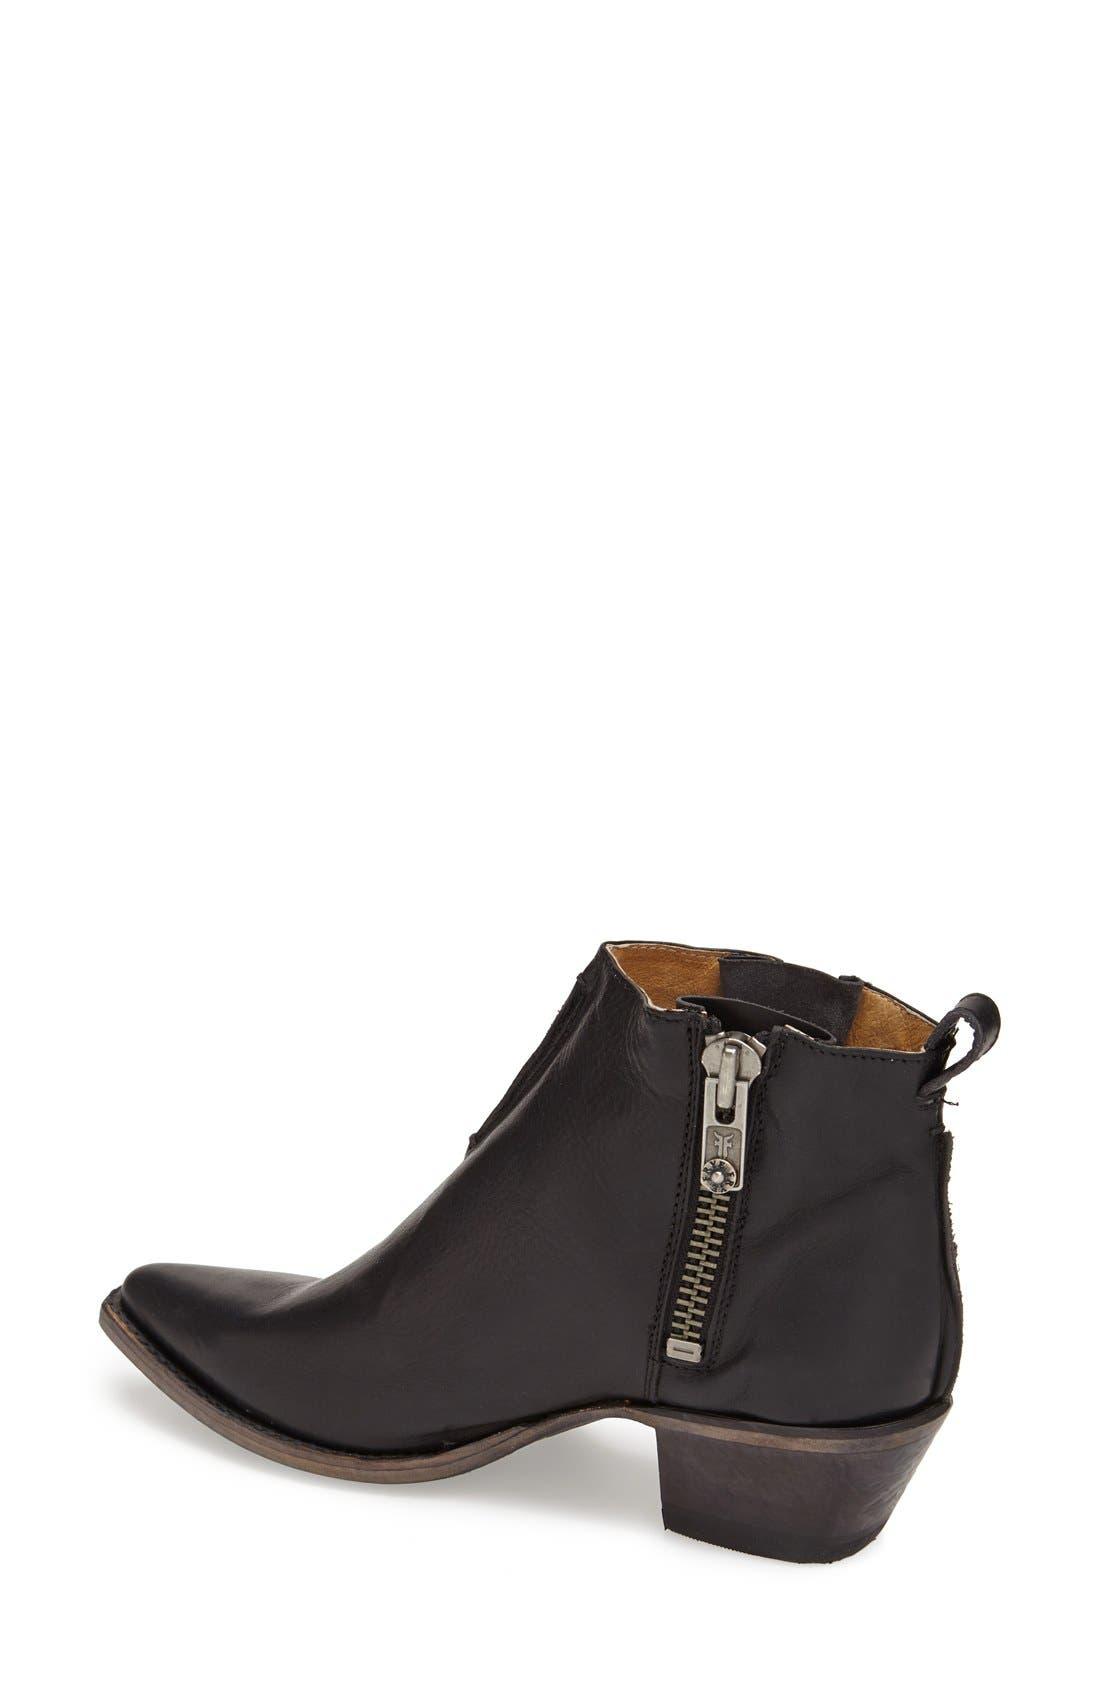 Alternate Image 2  - Frye 'Sacha' Washed Leather Ankle Boot (Women)